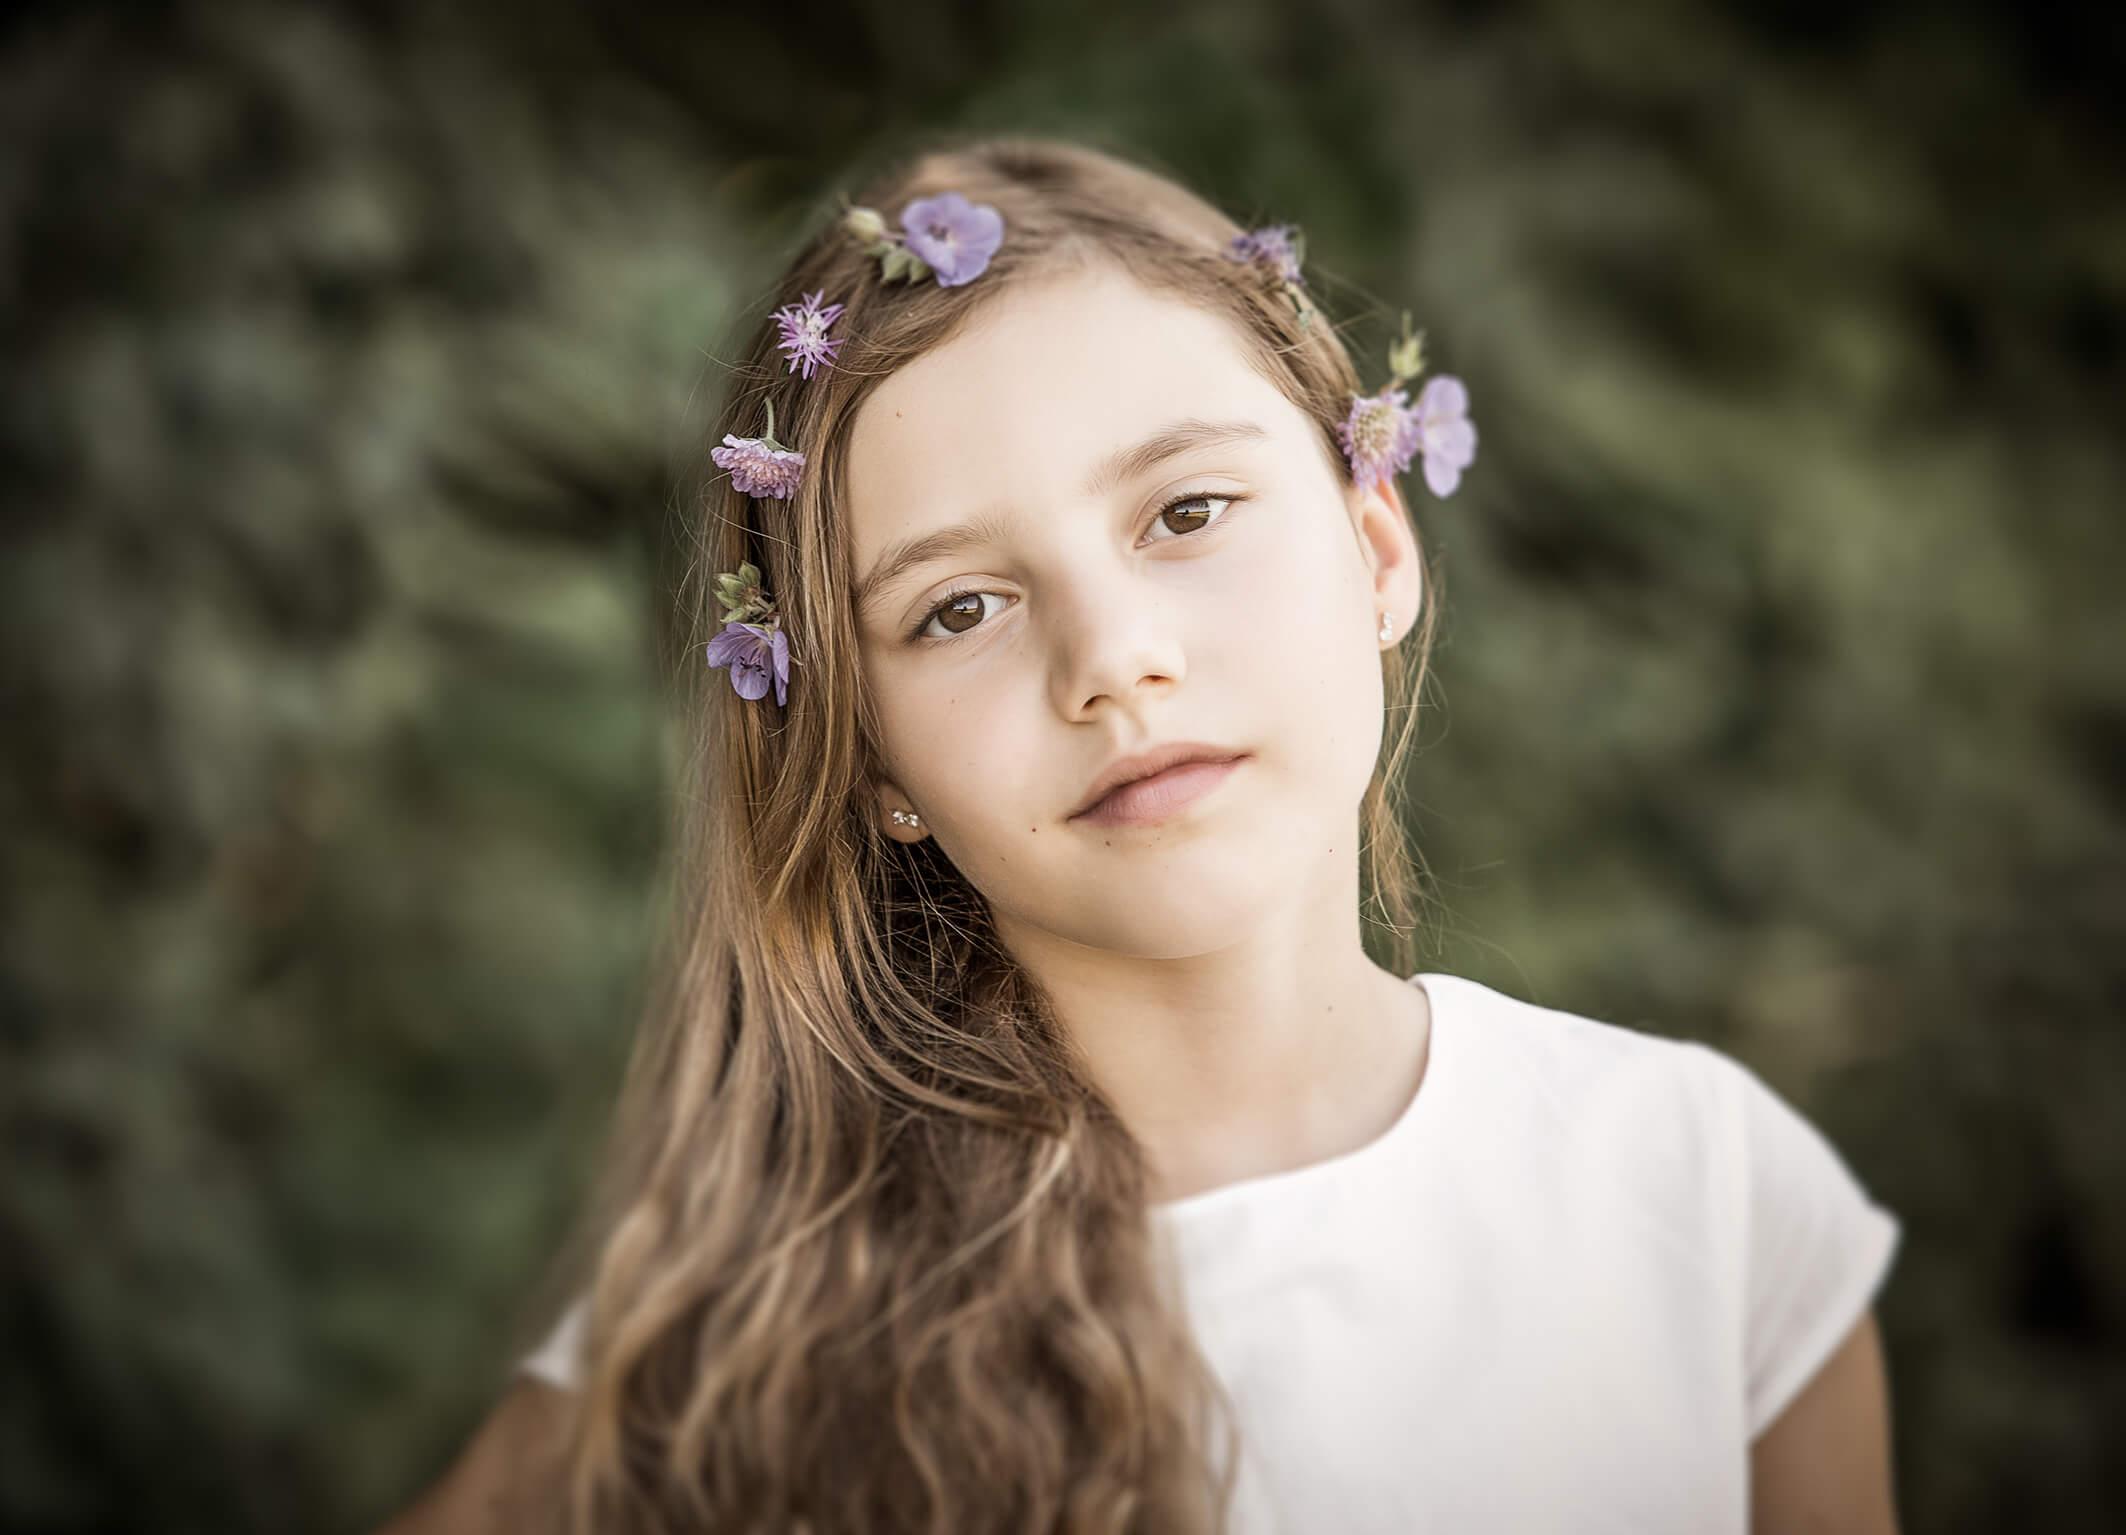 Kinderfotografie im Fotostudio LICHT/BLICK in Pegnitz